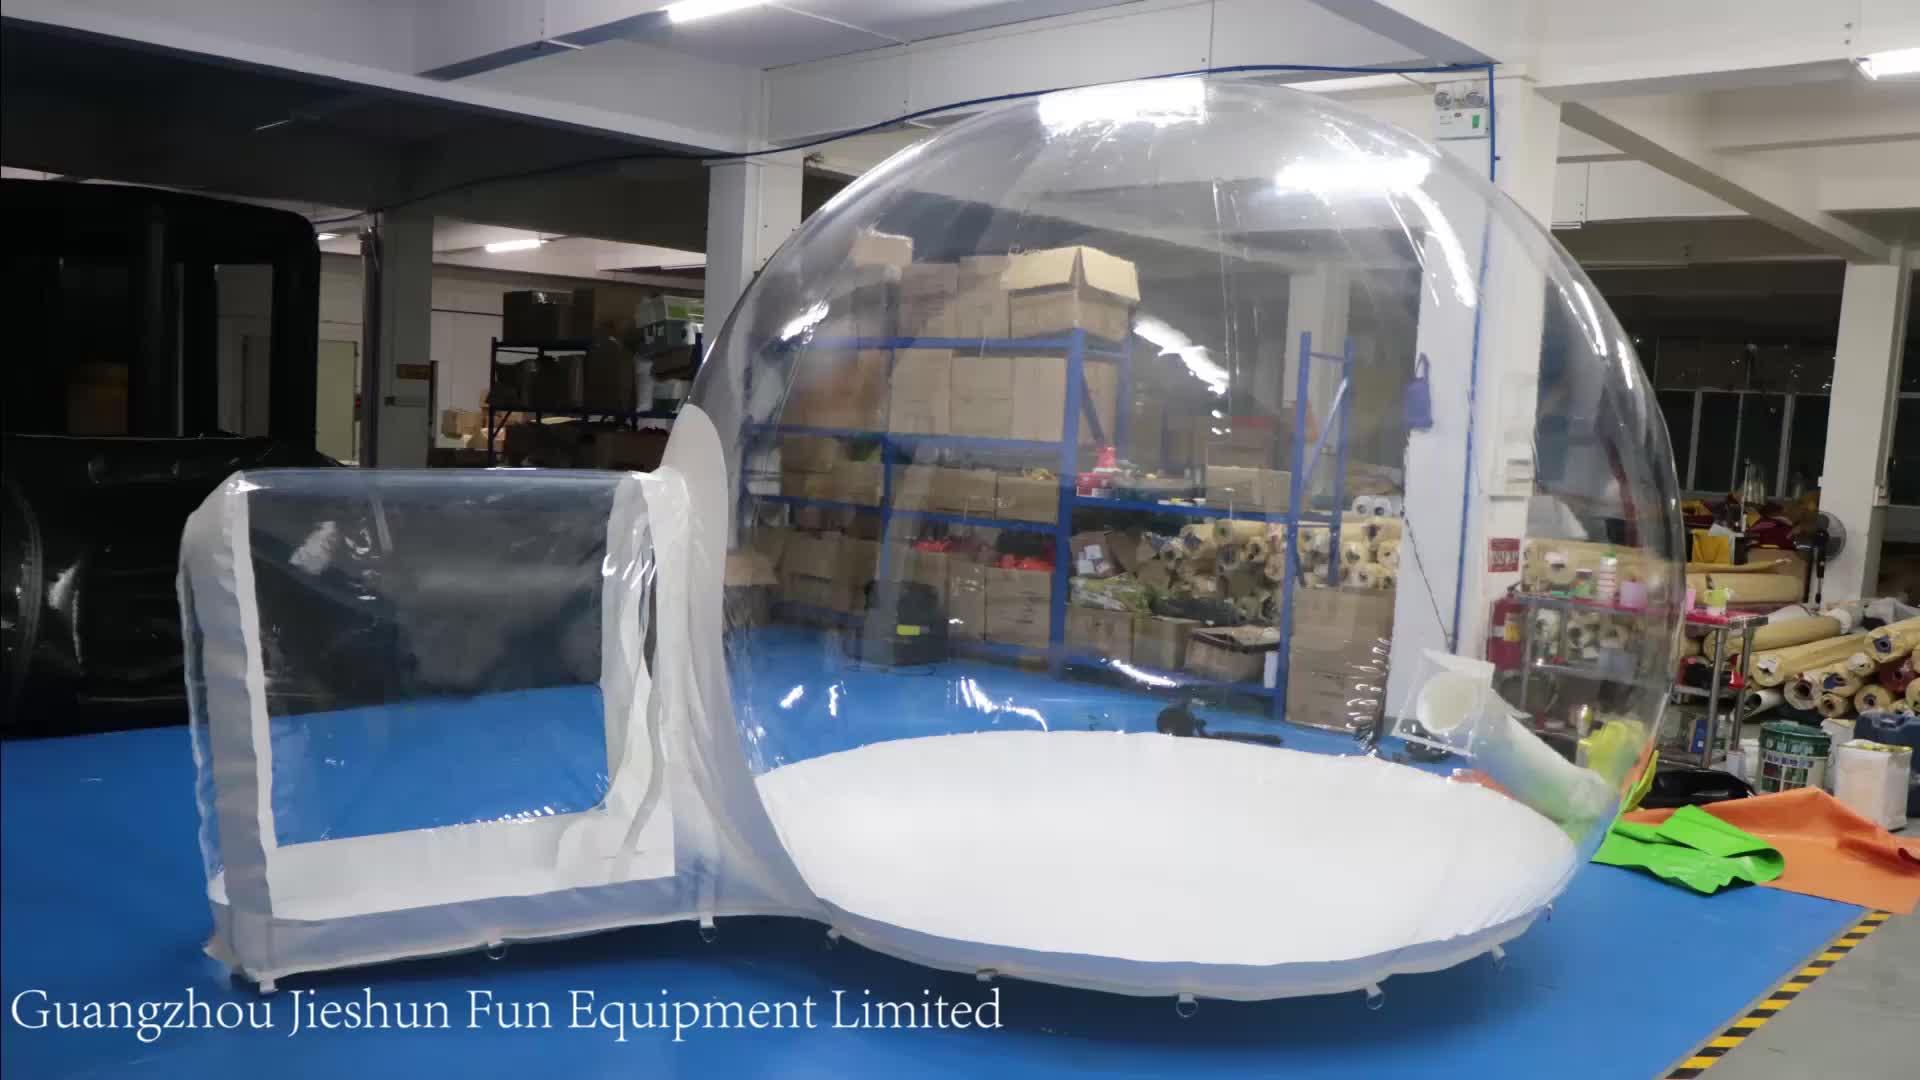 Vente chaude camping tente maison en plein air Igloo bulle tente gonflable dôme bulle neige globe tentes pour le camping